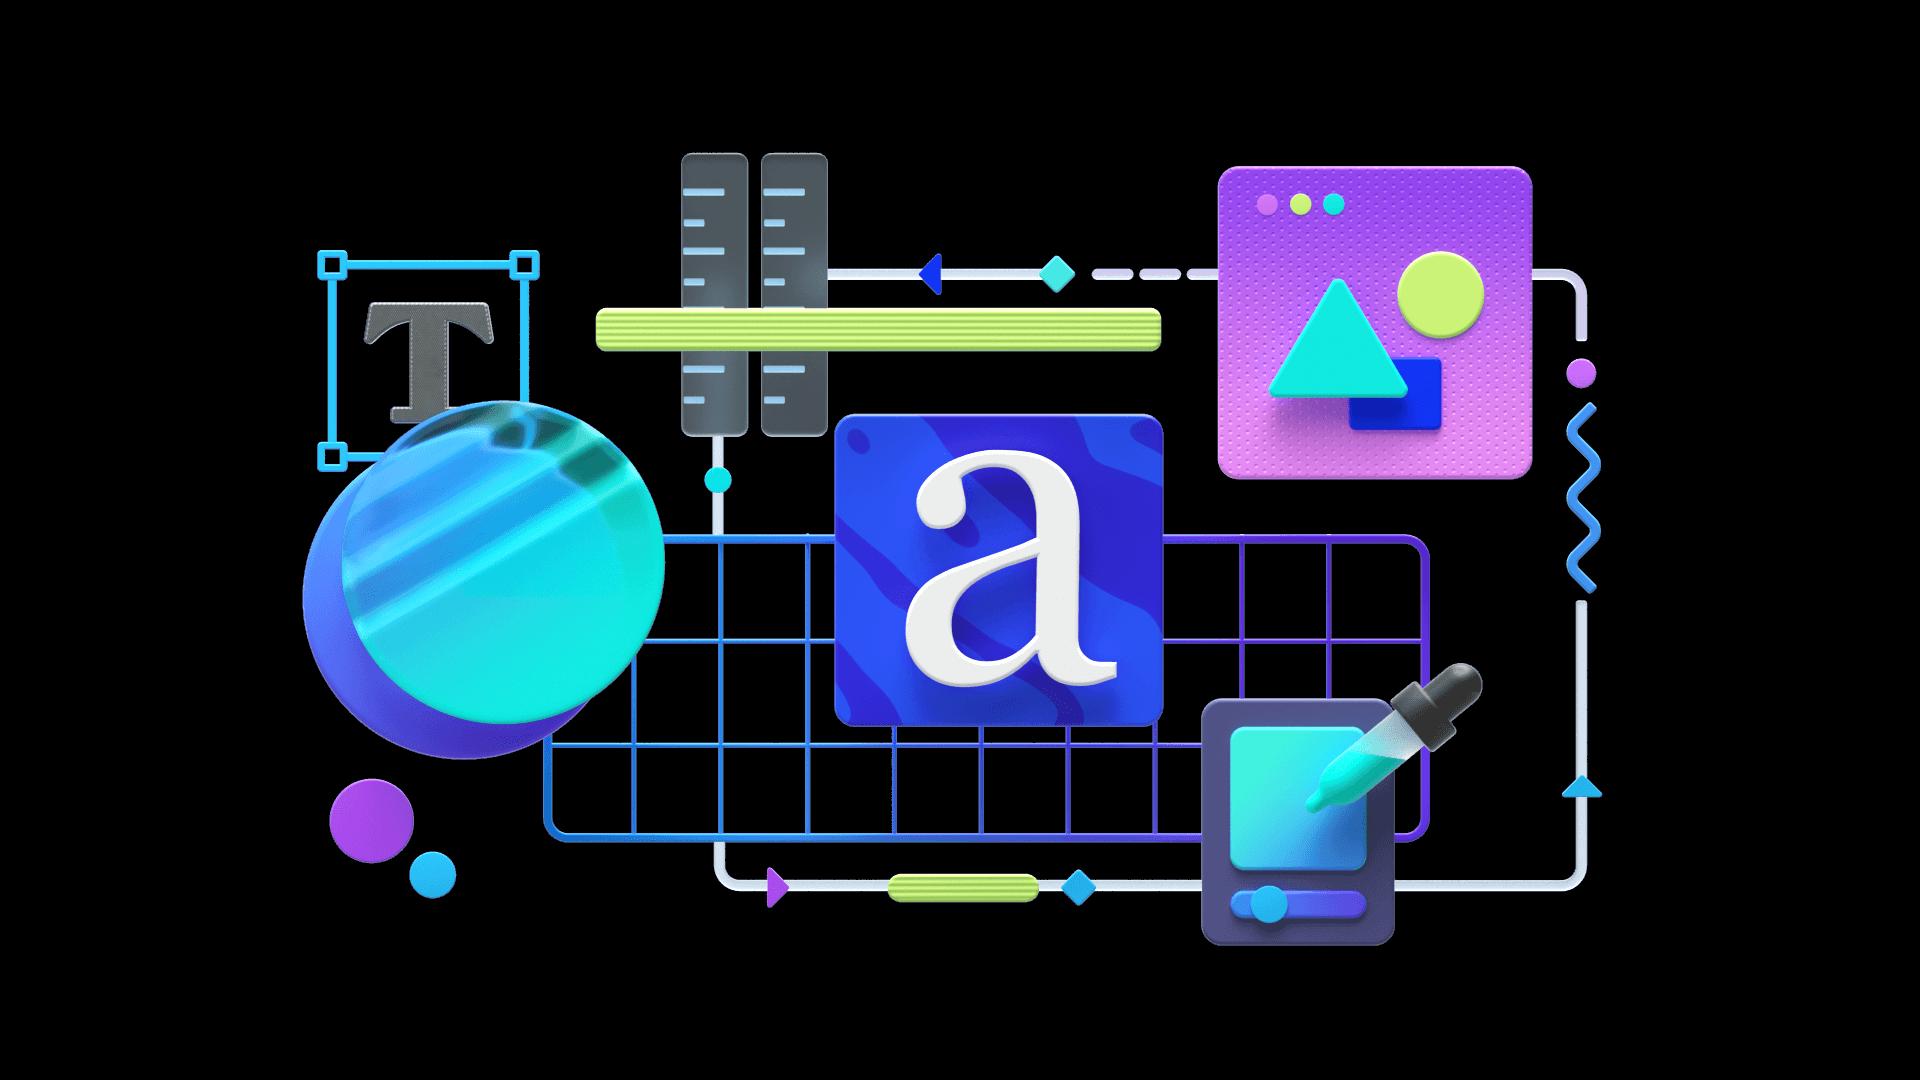 Colorful illustration showcasing Range's design services